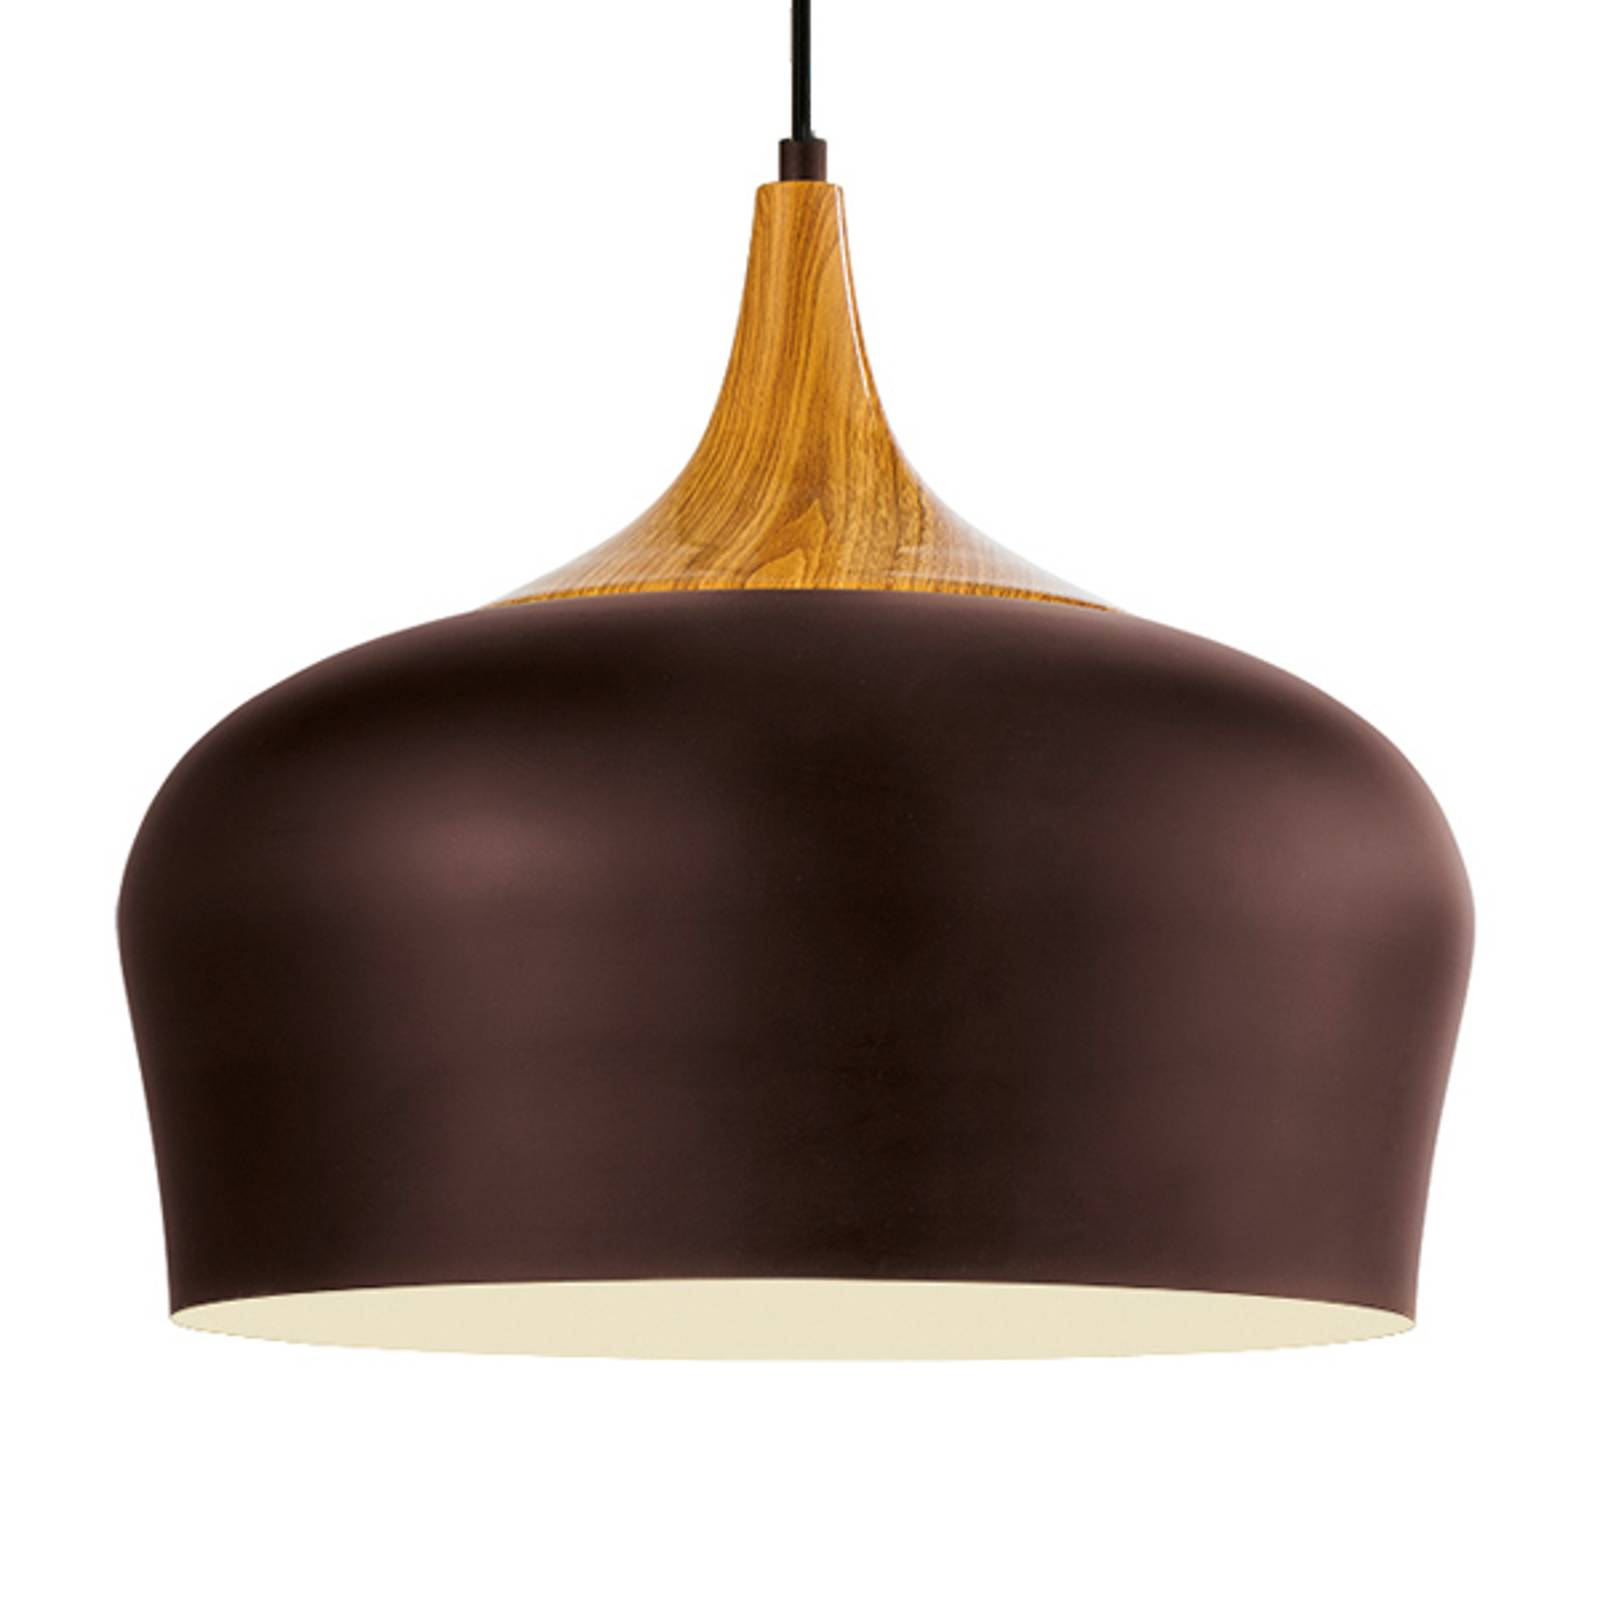 Obregon - mooi gevormde hanglamp in bruin